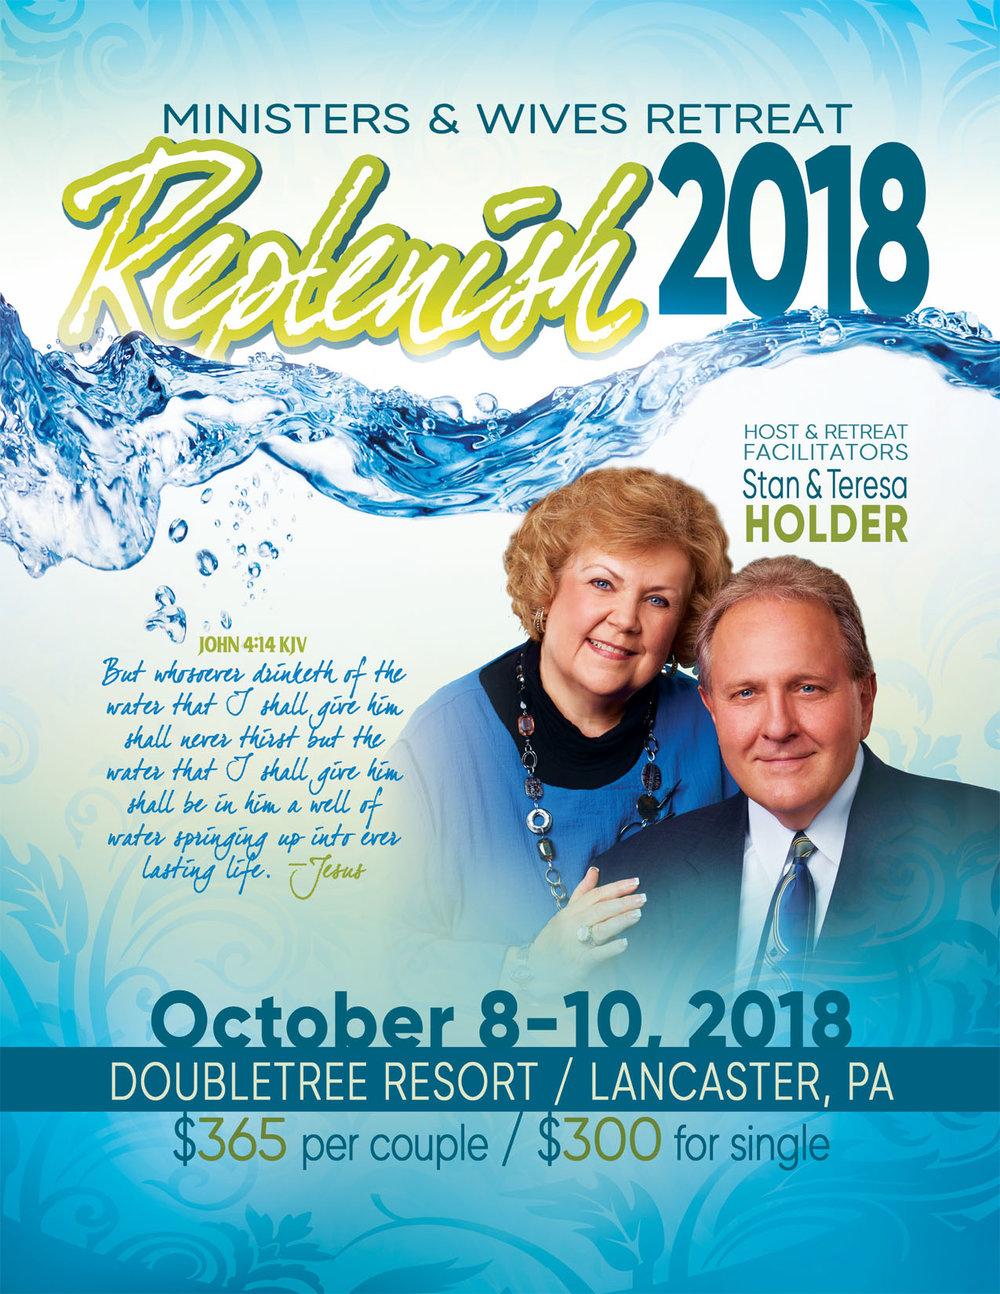 Replenish 2018 Minister&Wife Retreat AD _lowrez.jpg